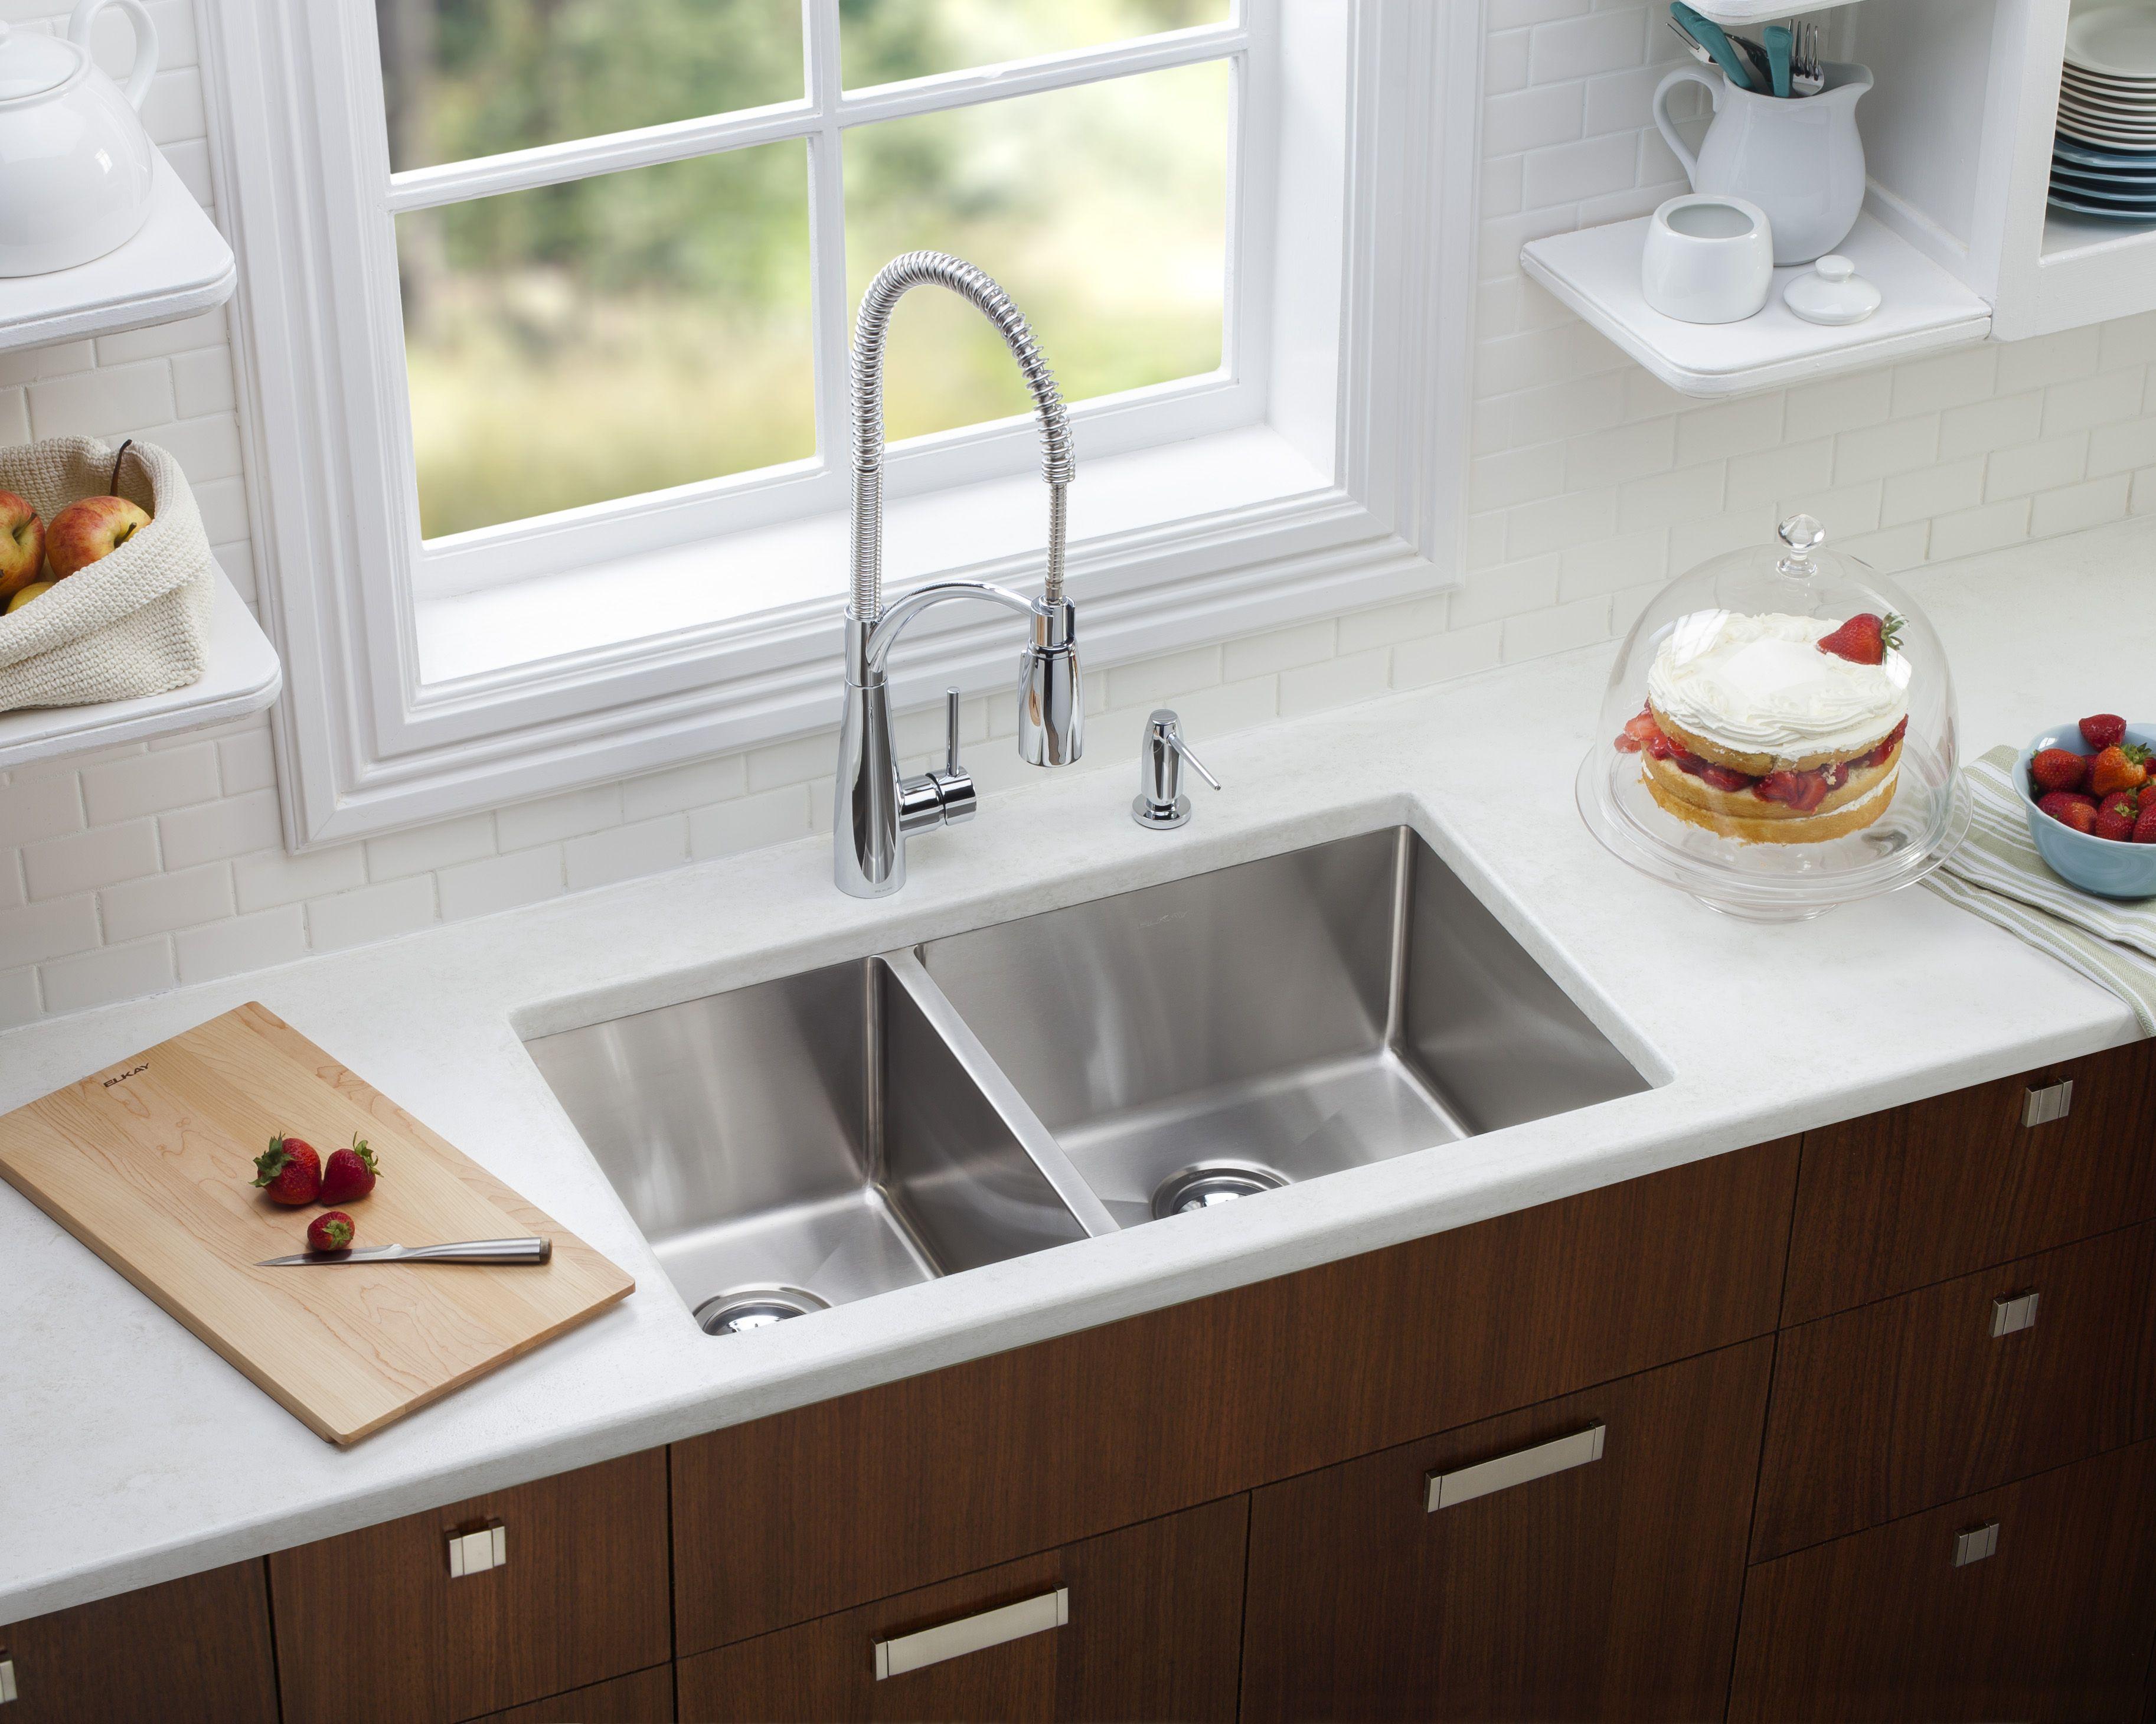 Tarjas de Cocina Acero Inoxidable kitchen sink